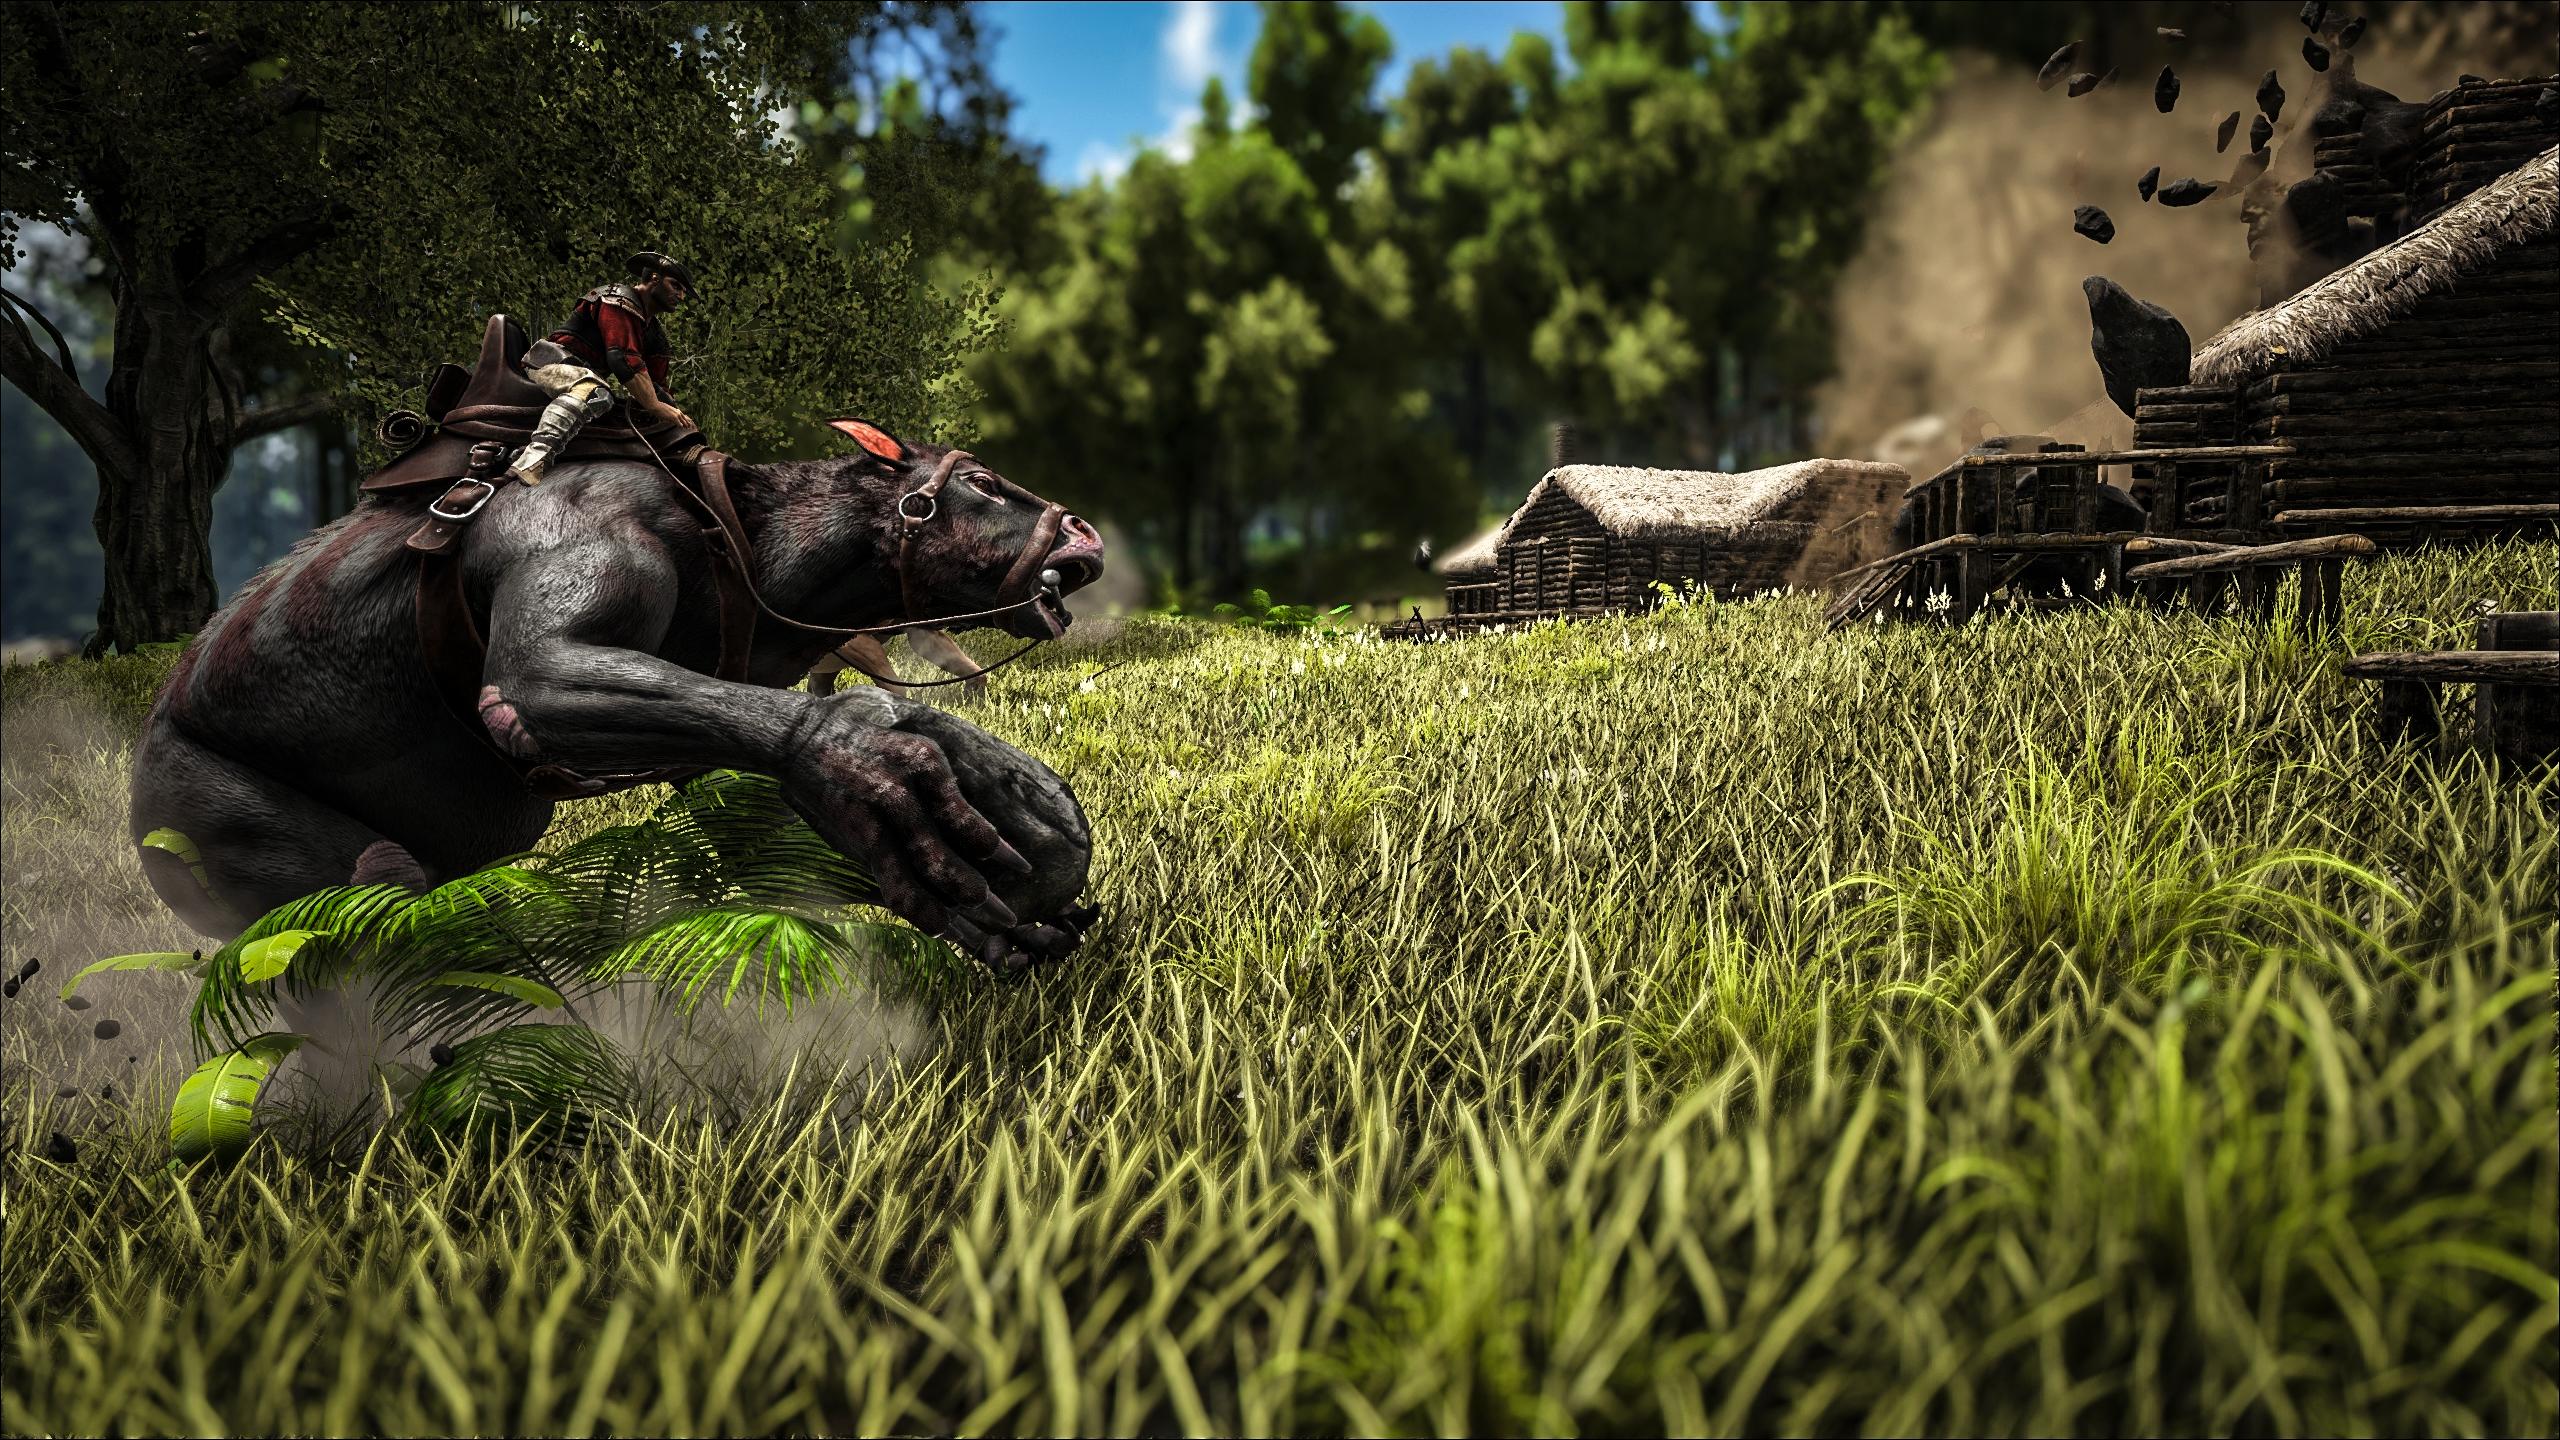 Fear Game Wallpaper Little Girl Latest Ark Survival Evolved Update Includes New Dinosaurs